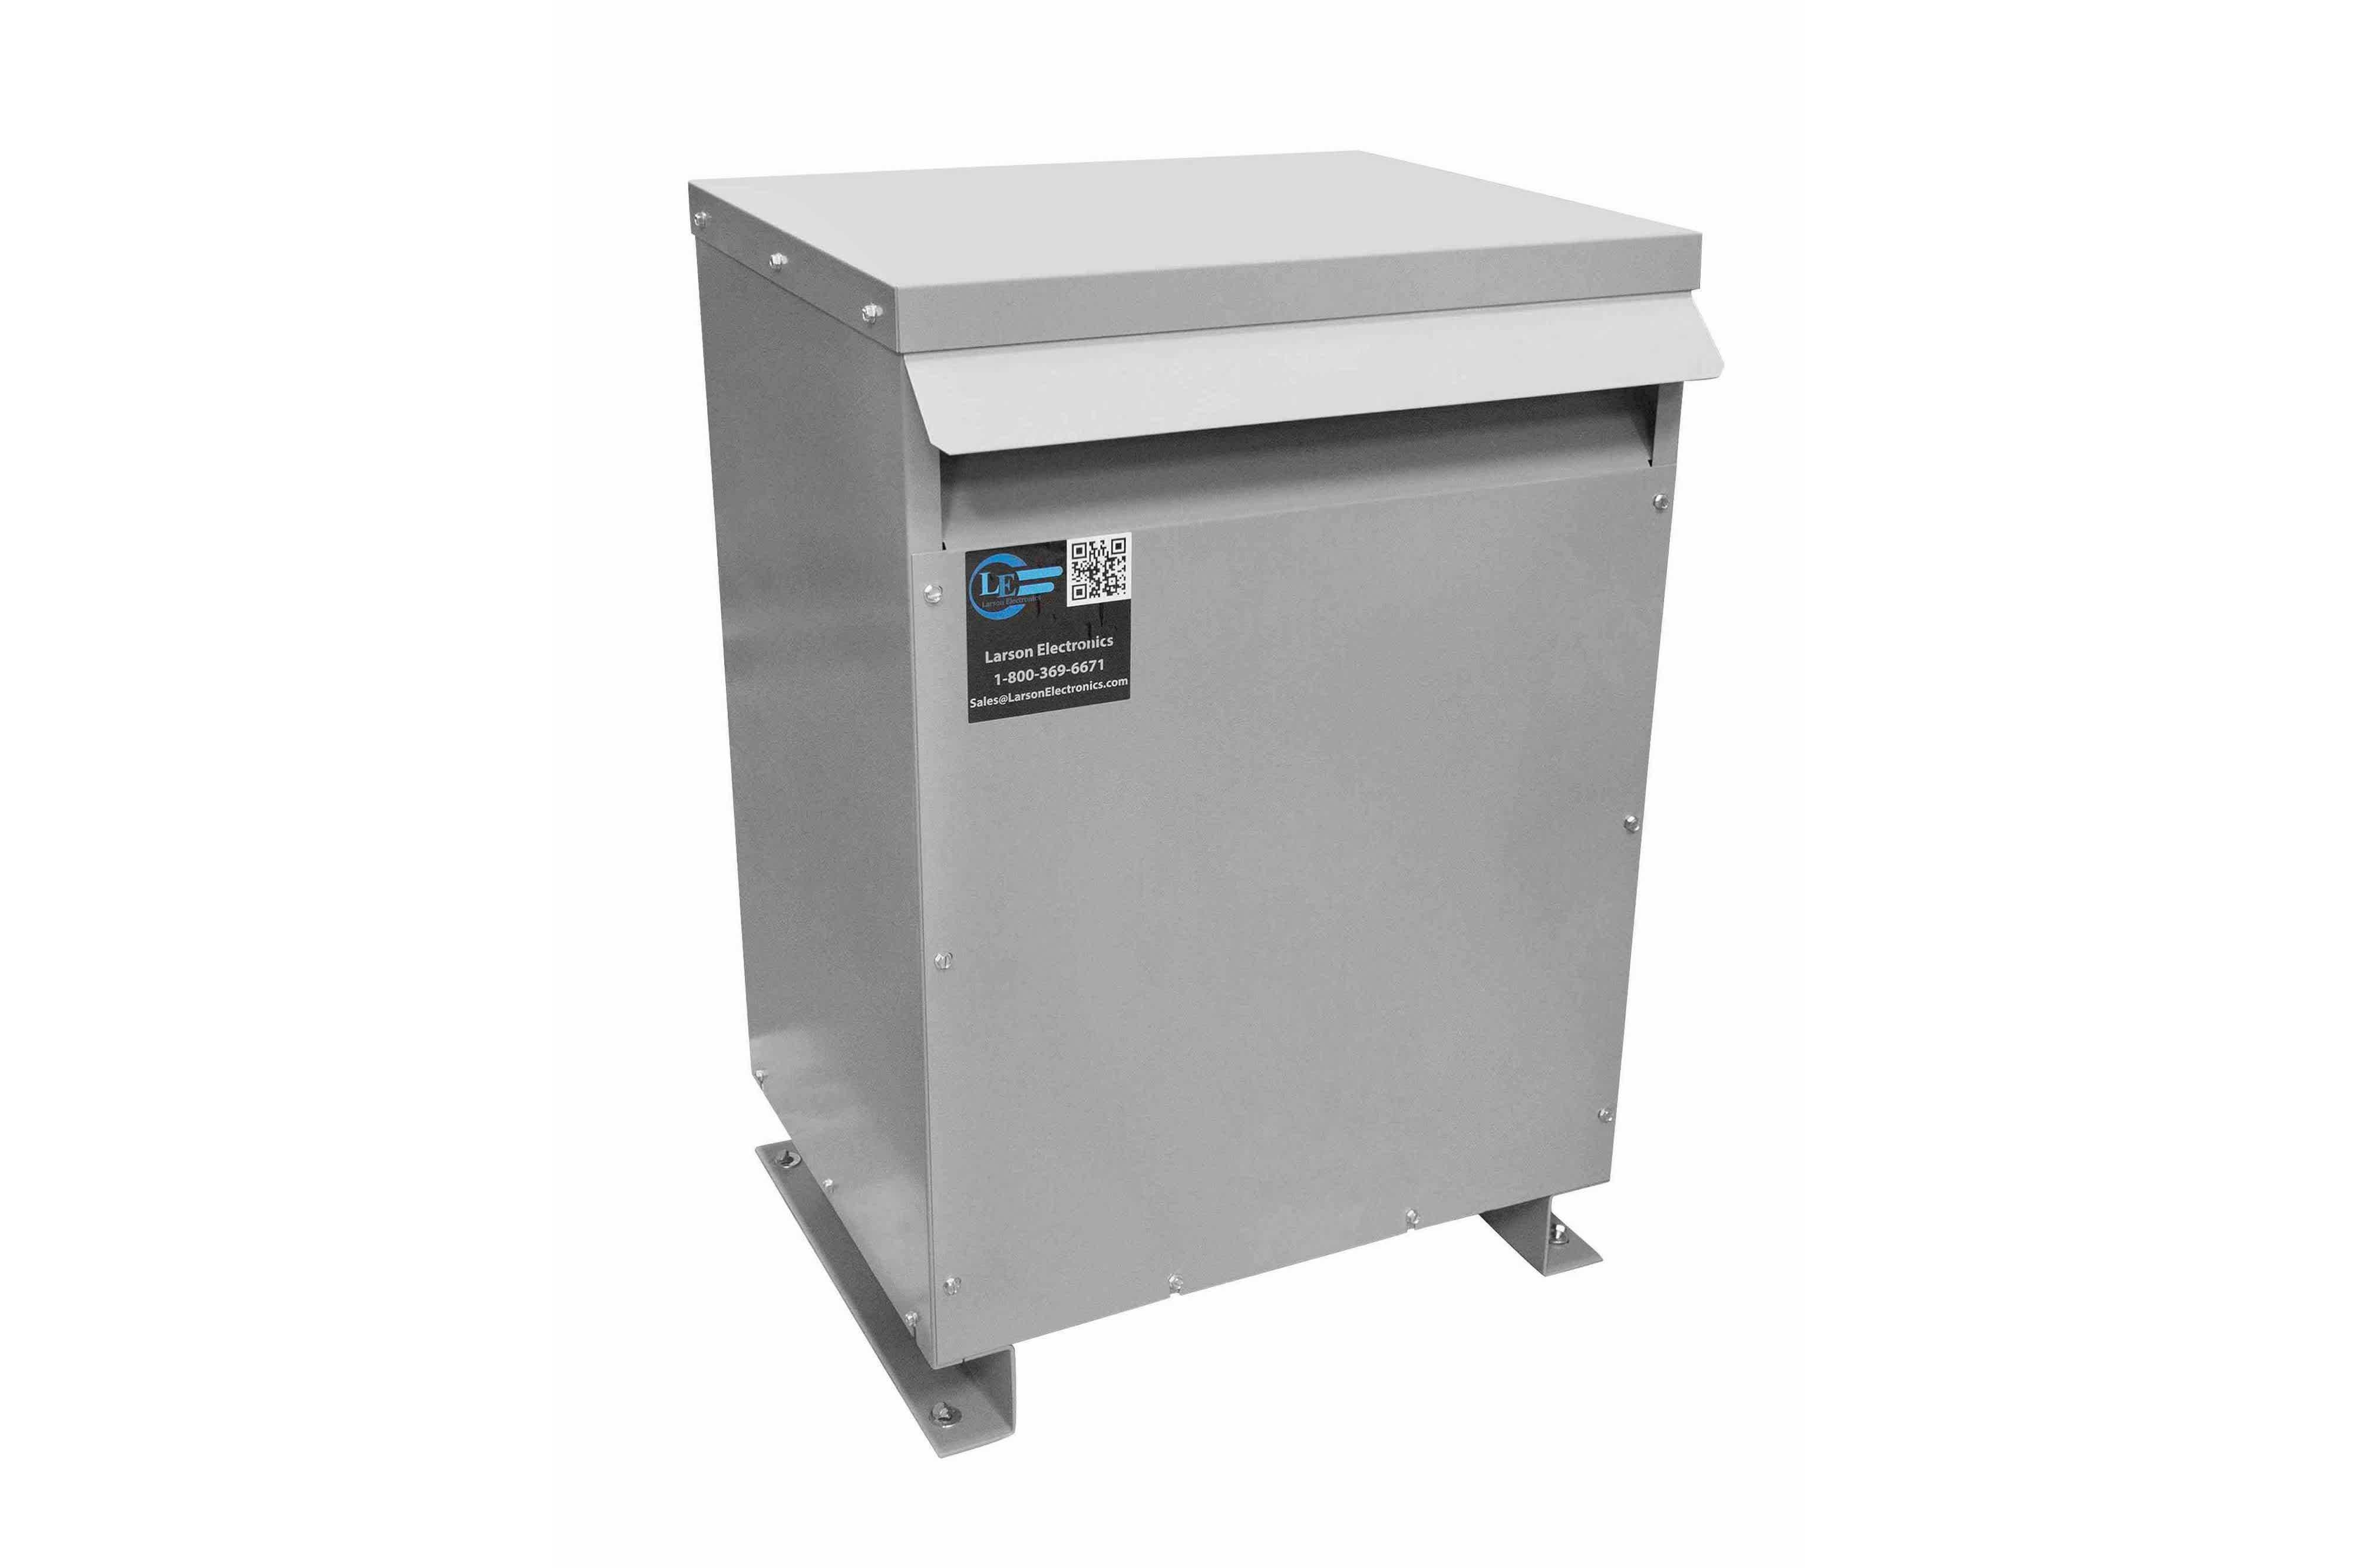 110 kVA 3PH Isolation Transformer, 480V Wye Primary, 480V Delta Secondary, N3R, Ventilated, 60 Hz